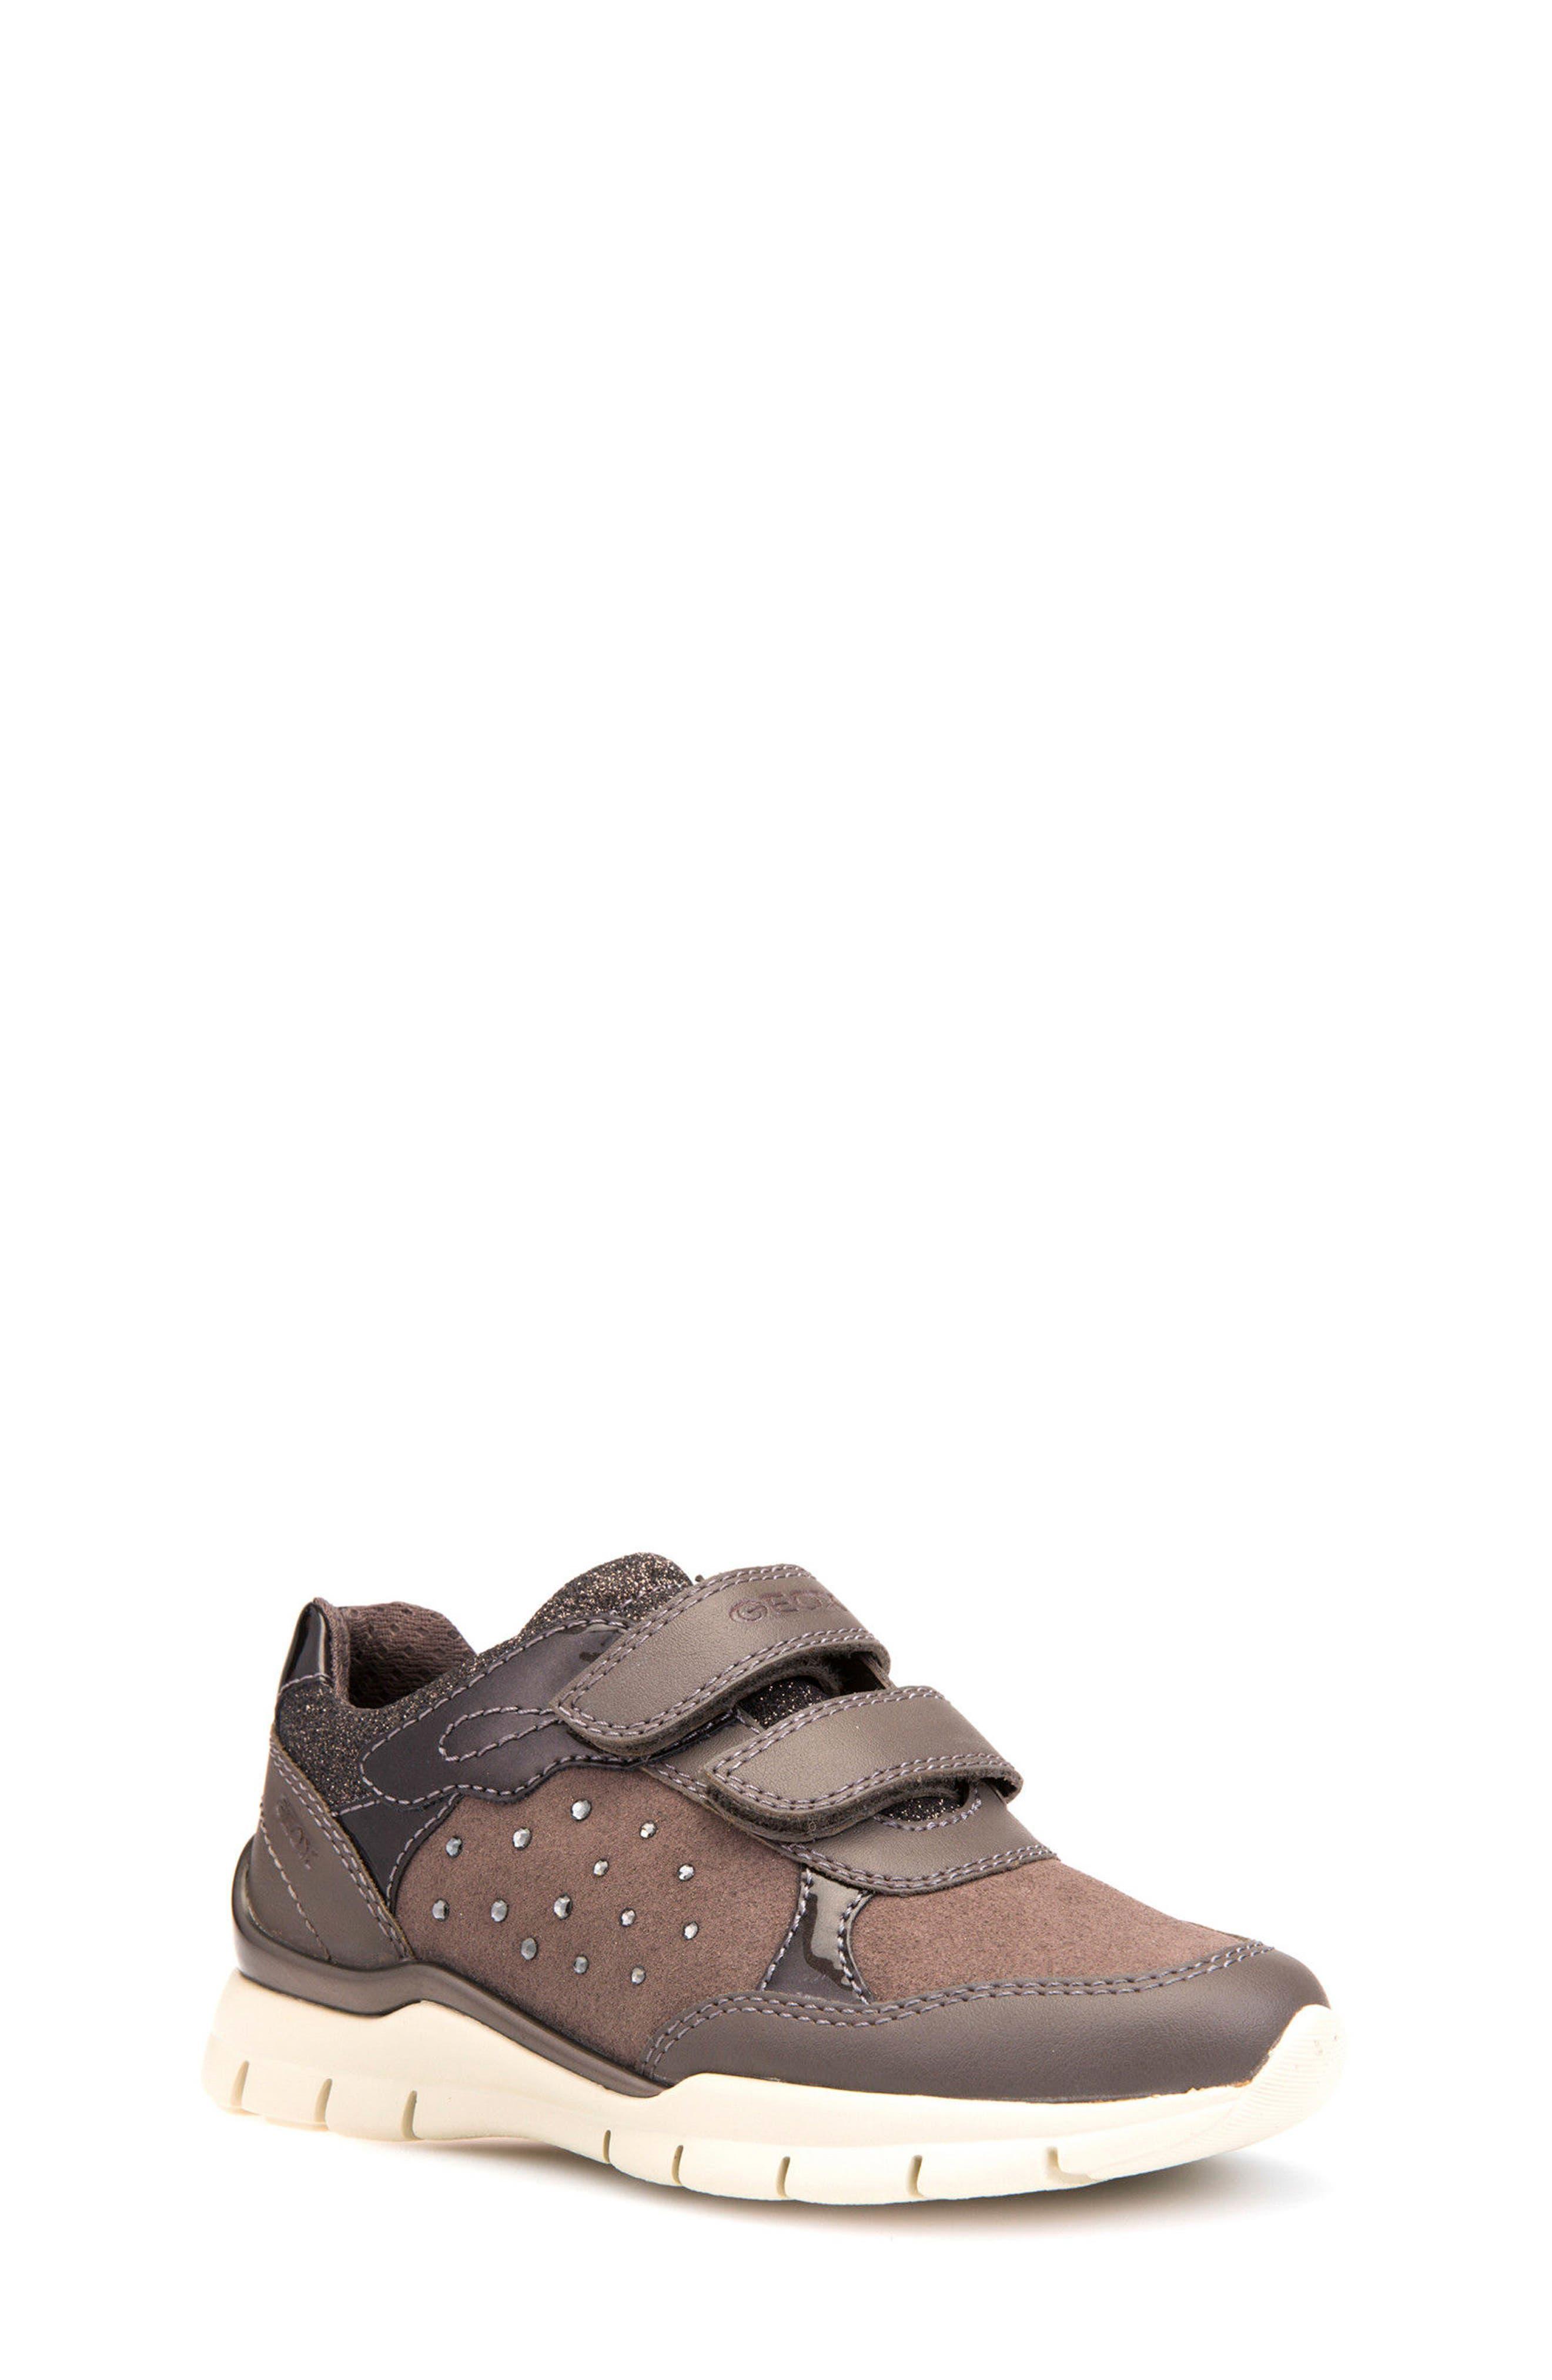 Sukie Sneaker,                         Main,                         color, 200